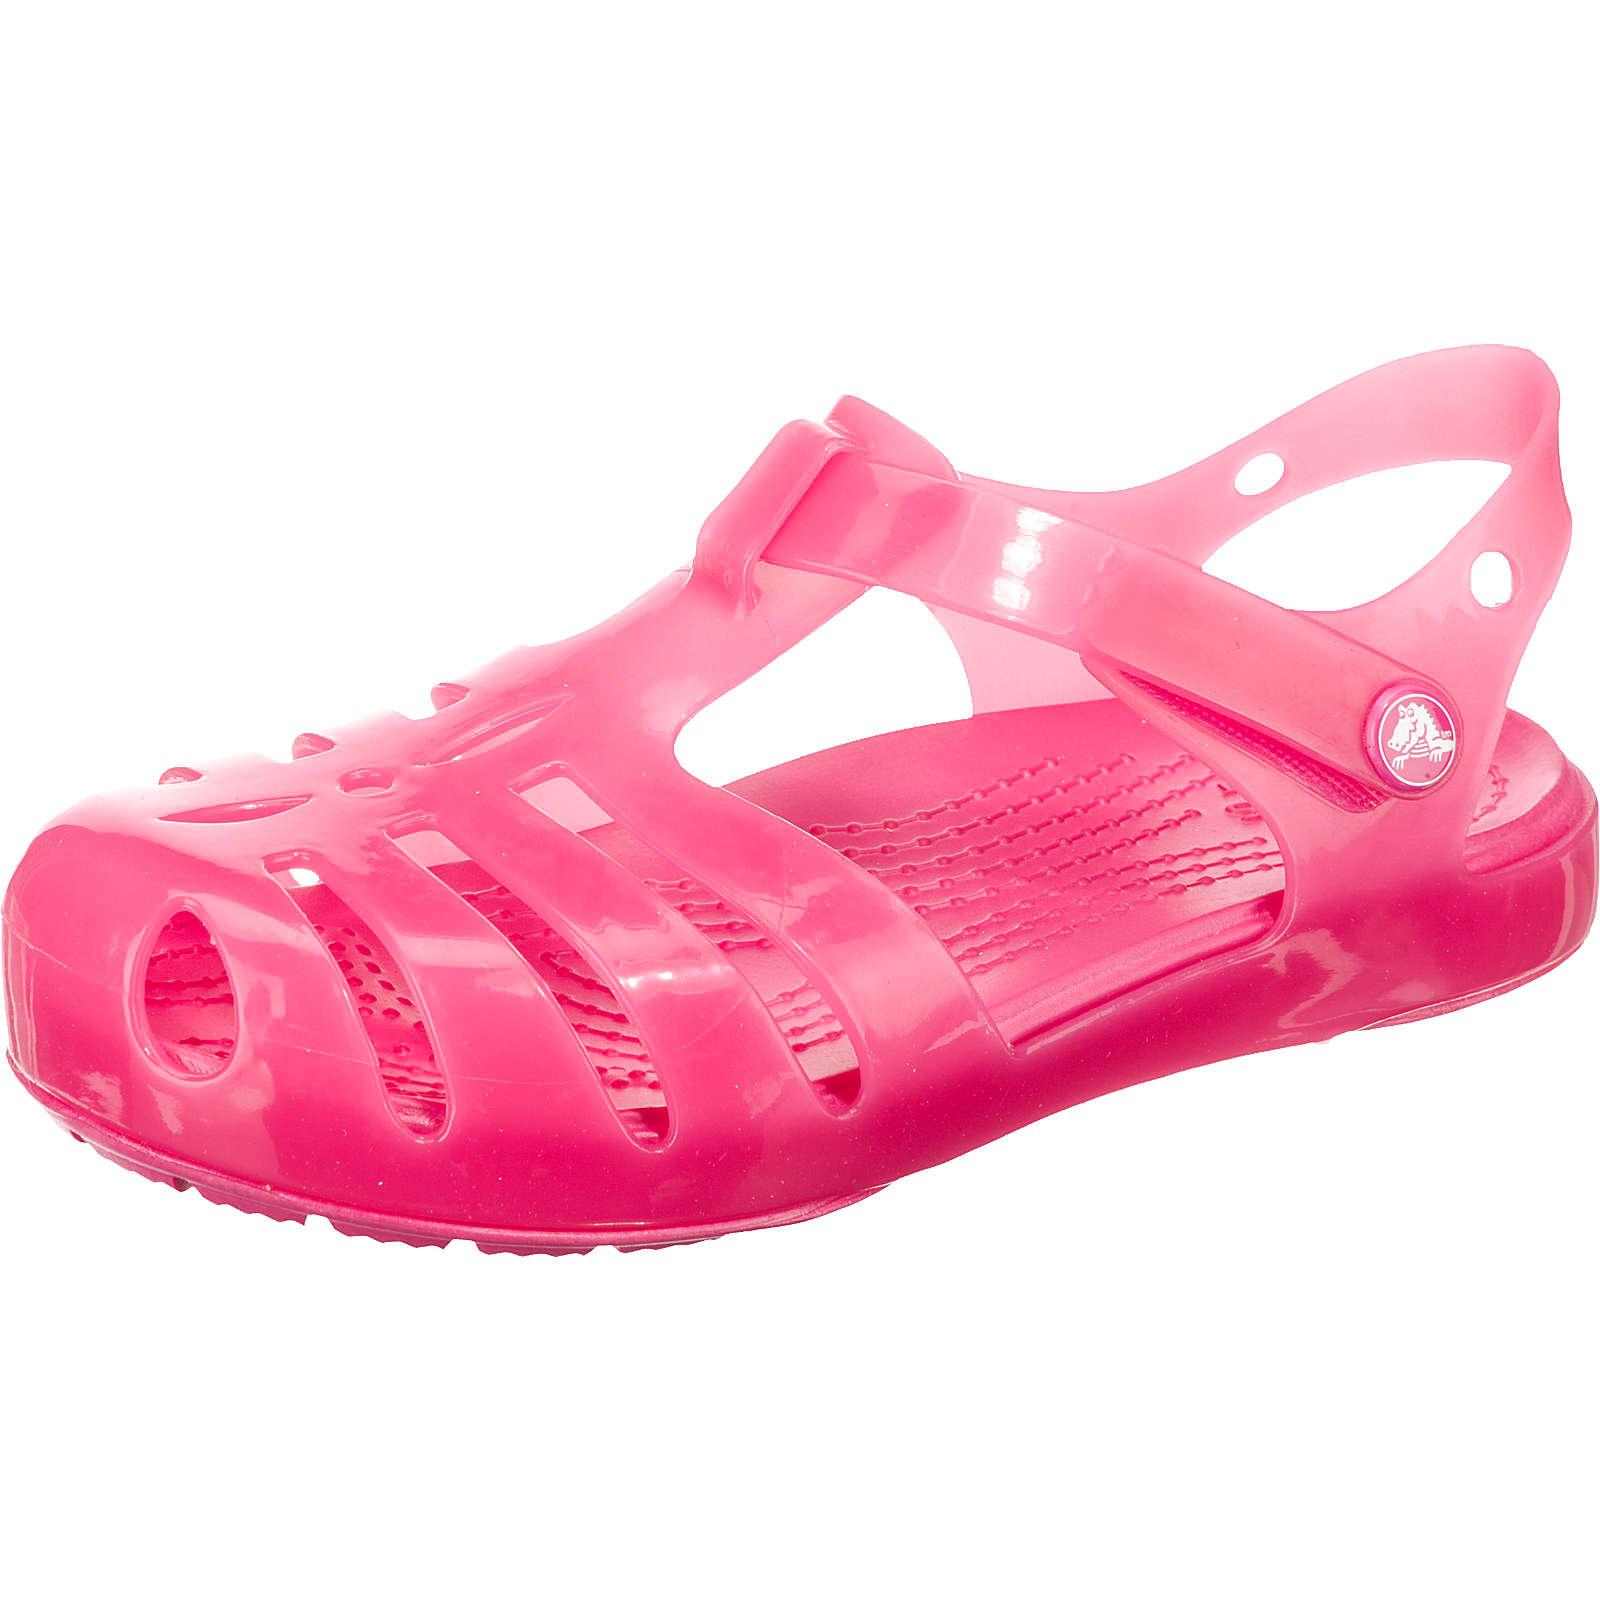 CROCS Badeschuhe für Mädchen pink Mädchen Gr. 30/31